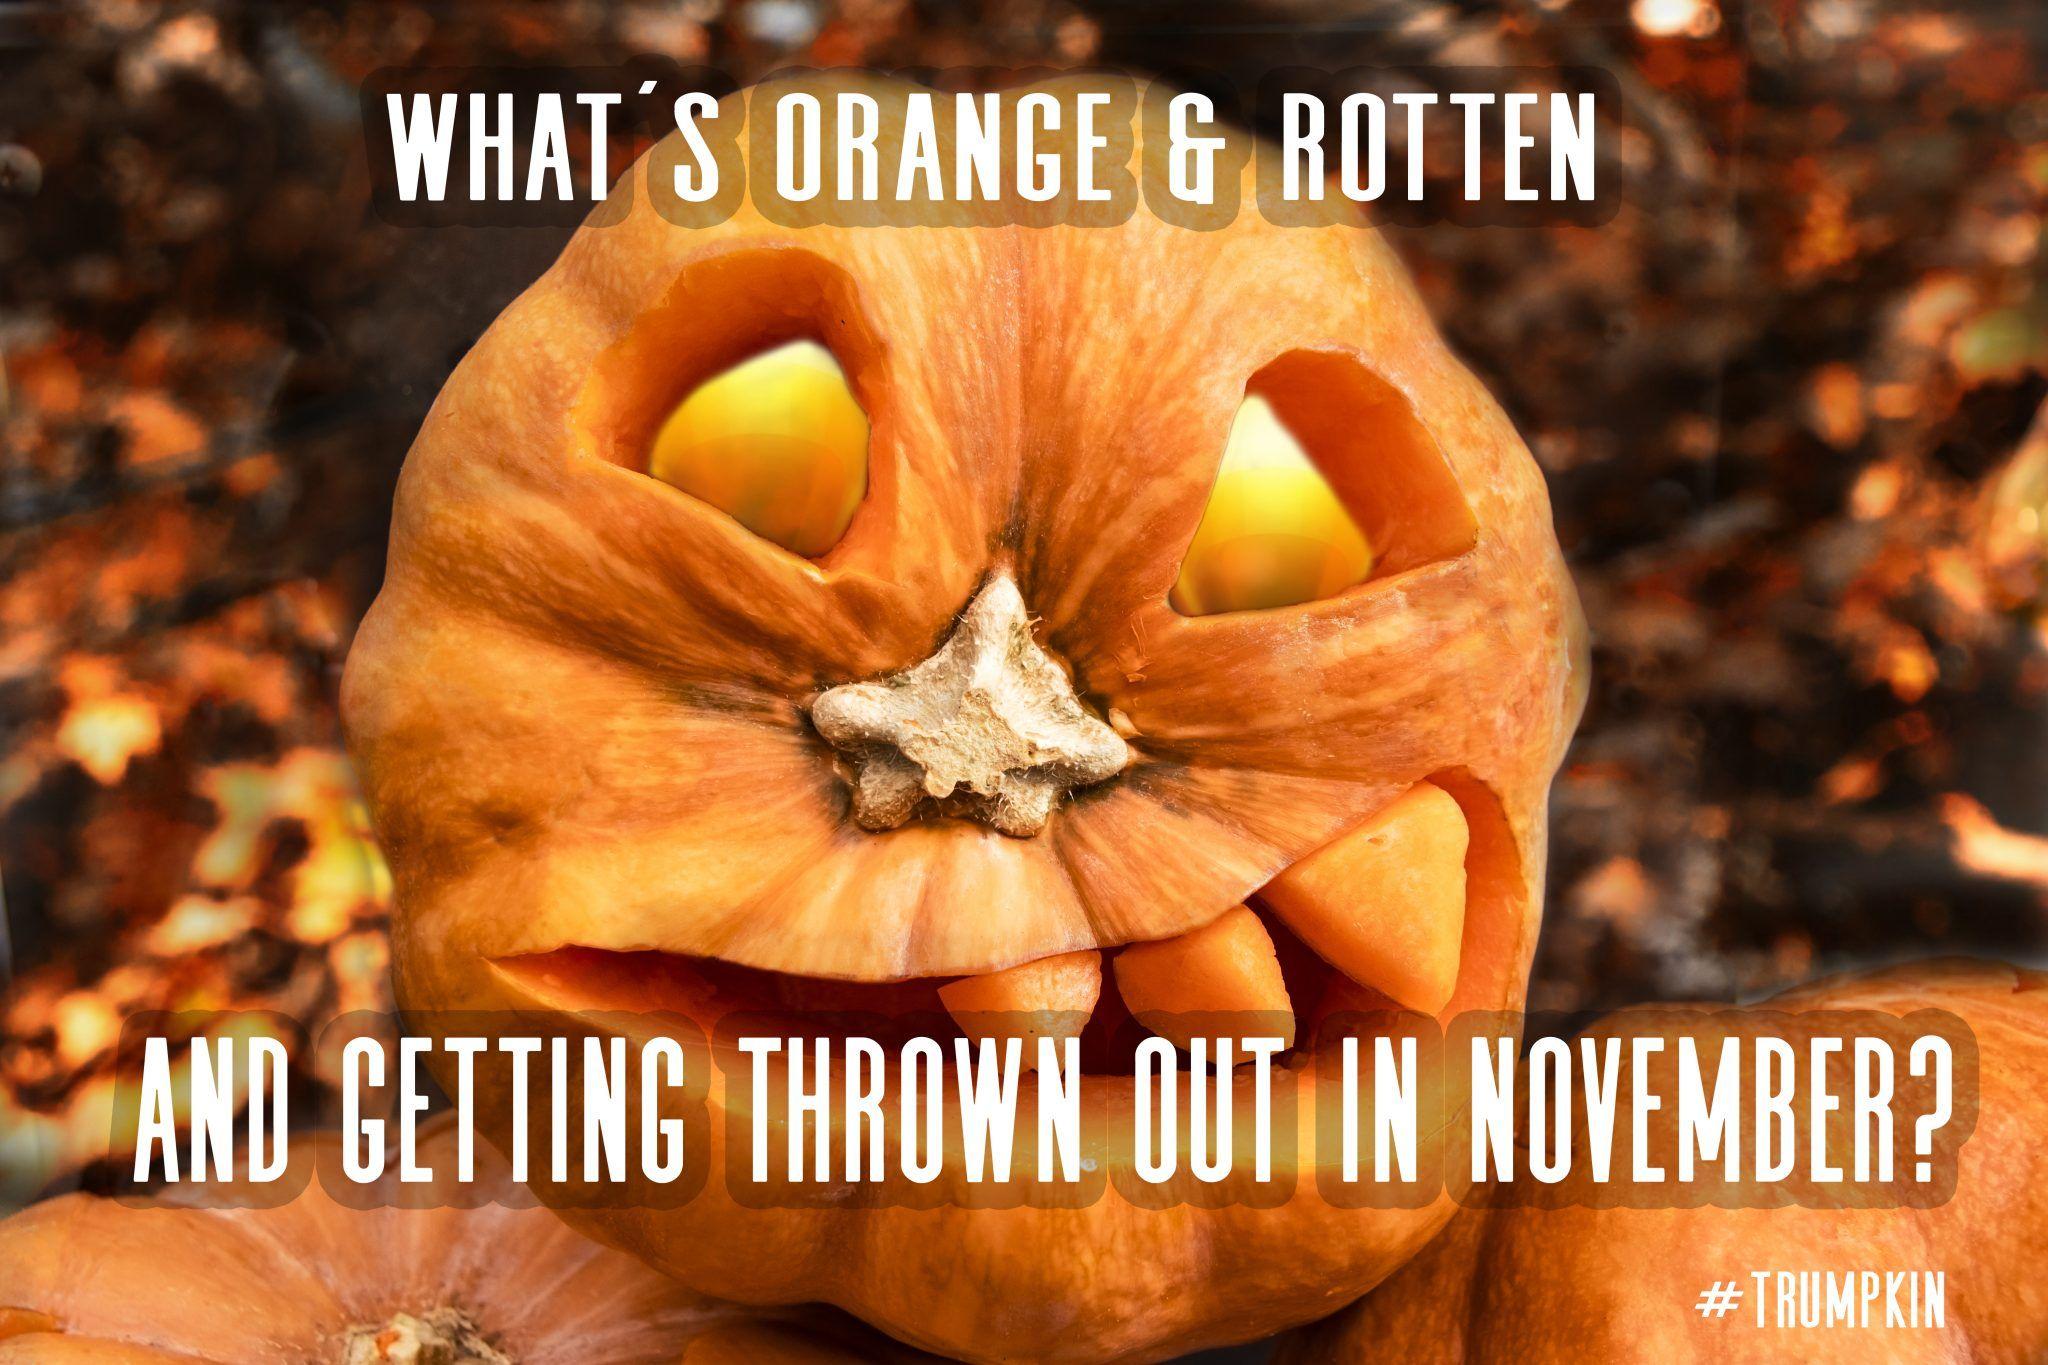 Happy Halloween Funny Memes 2020 Halloween Memes in 2020 | Halloween memes, Happy halloween meme